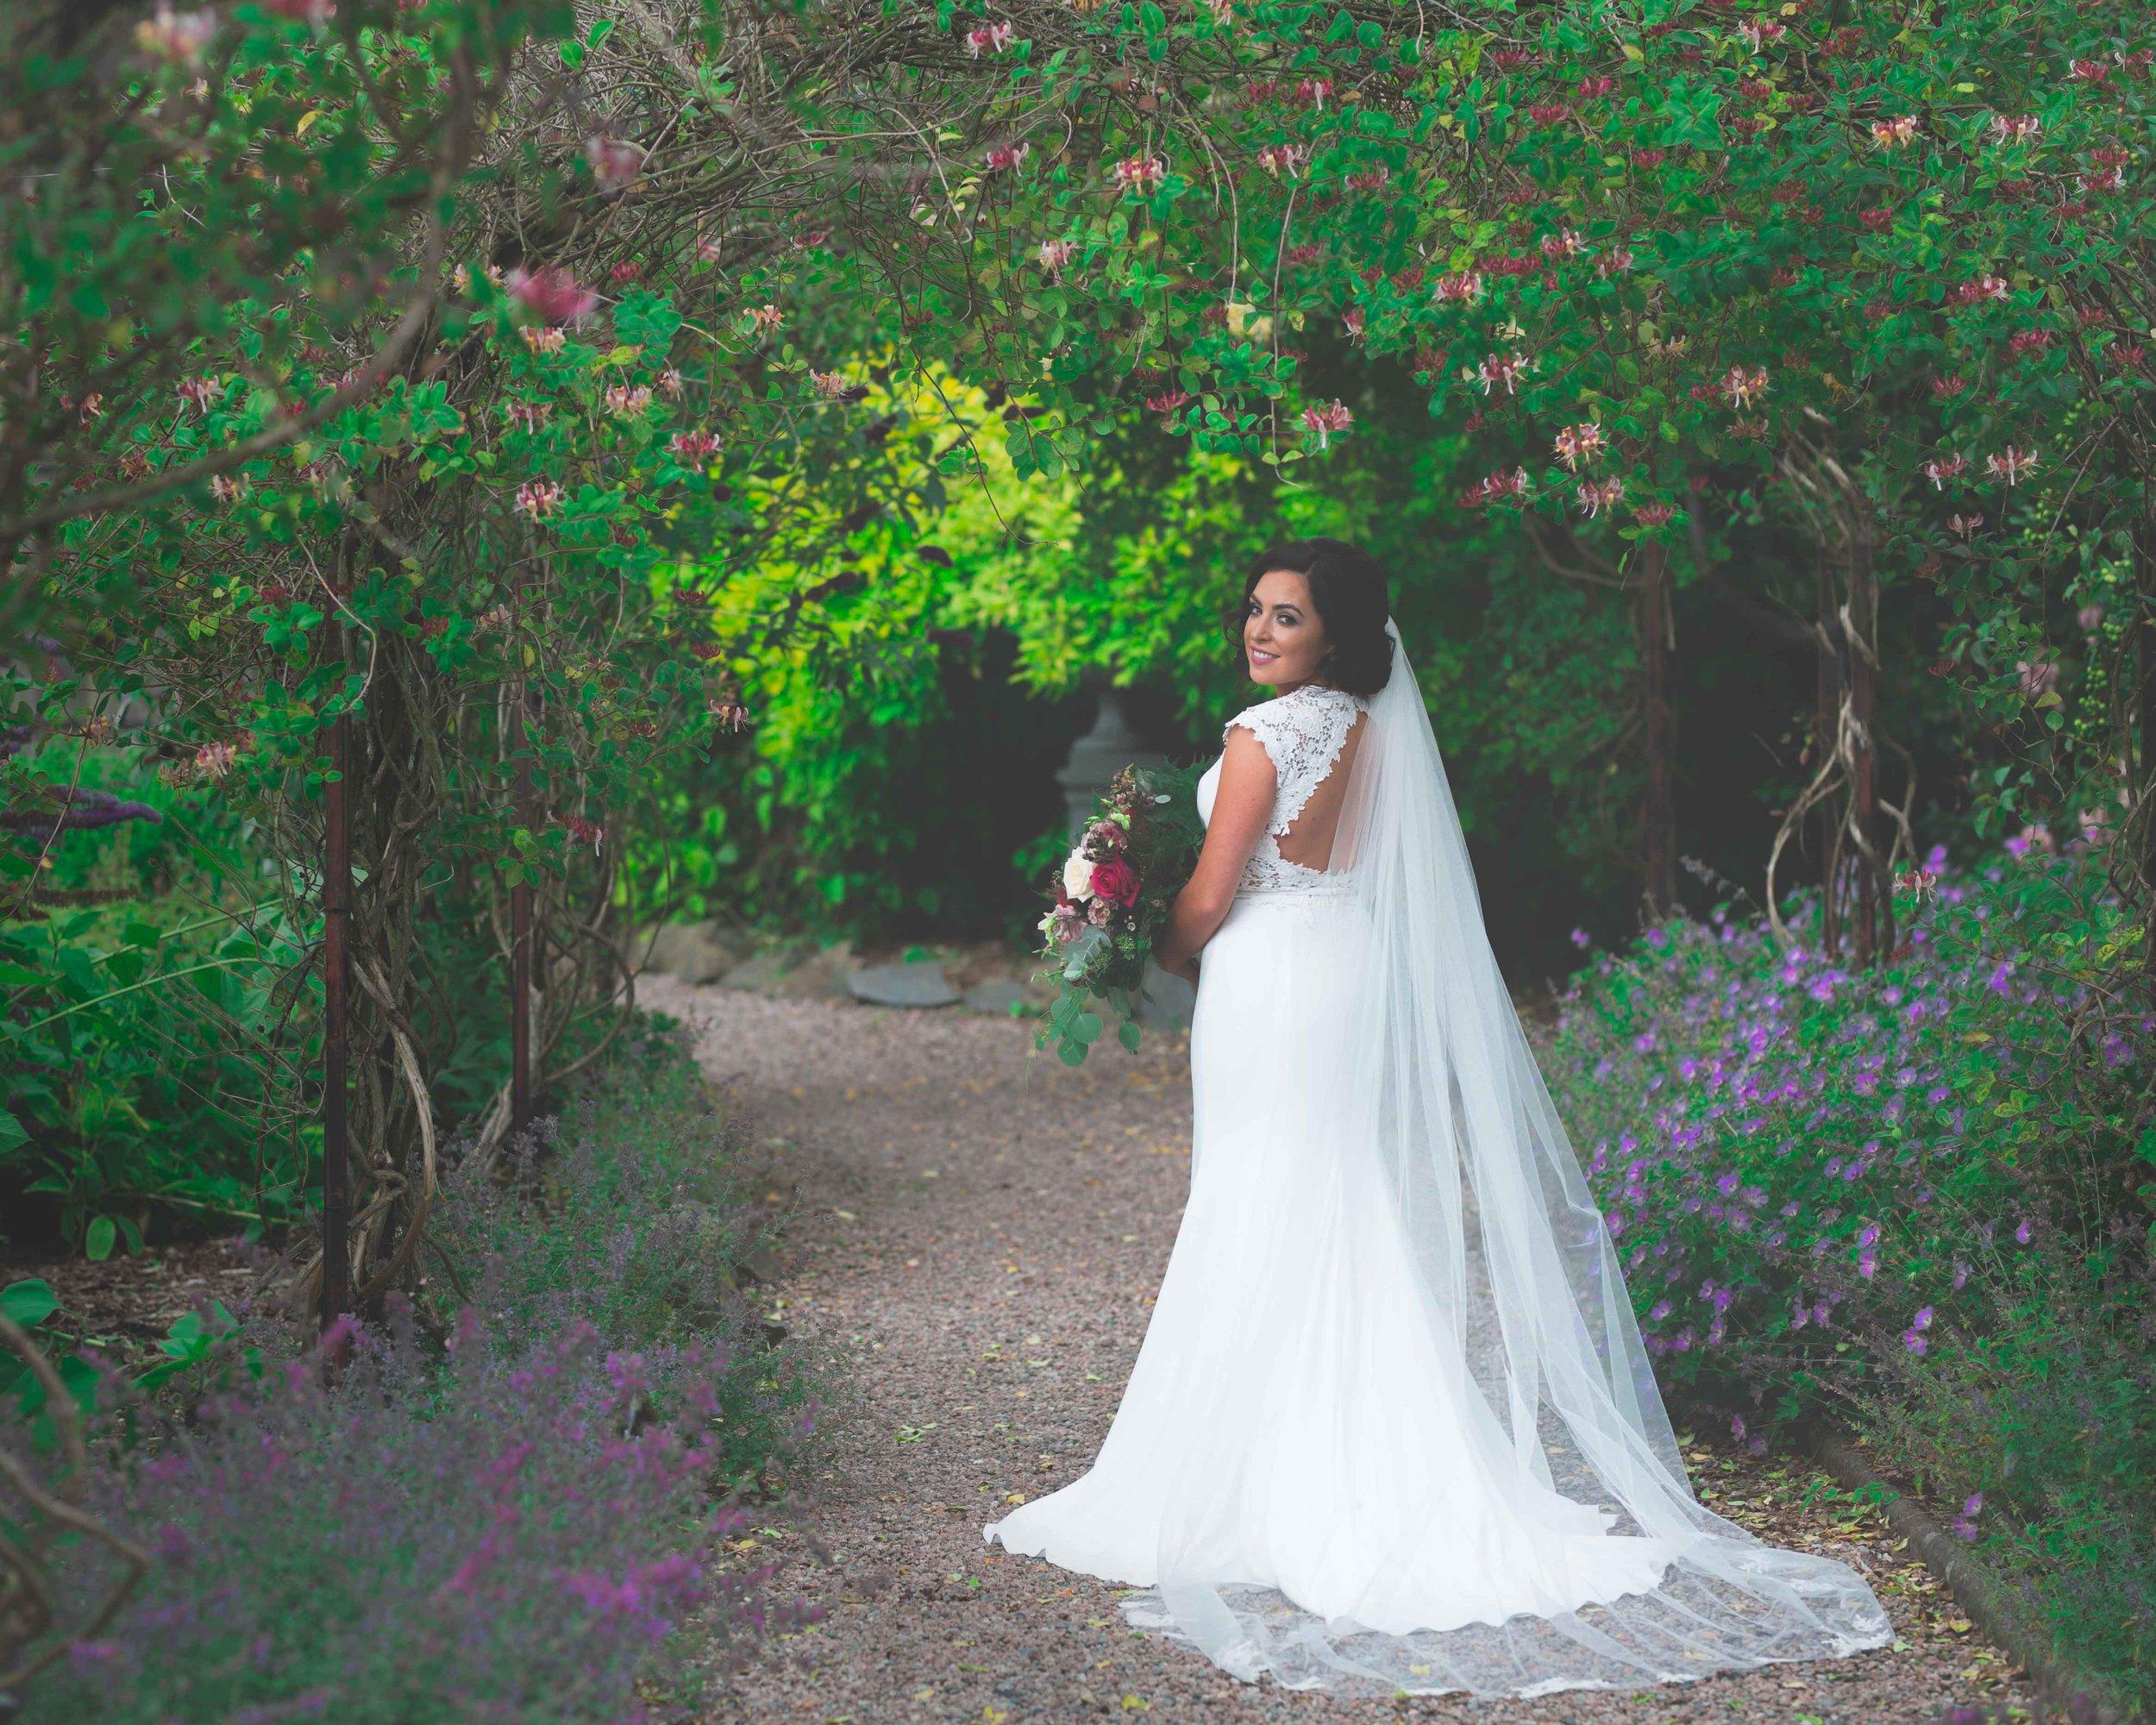 Northern Ireland Wedding Photographer   Brian McEwan Photography   Affordable Wedding Photography Throughout Antrim Down Armagh Tyrone Londonderry Derry Down Fermanagh -15.jpg